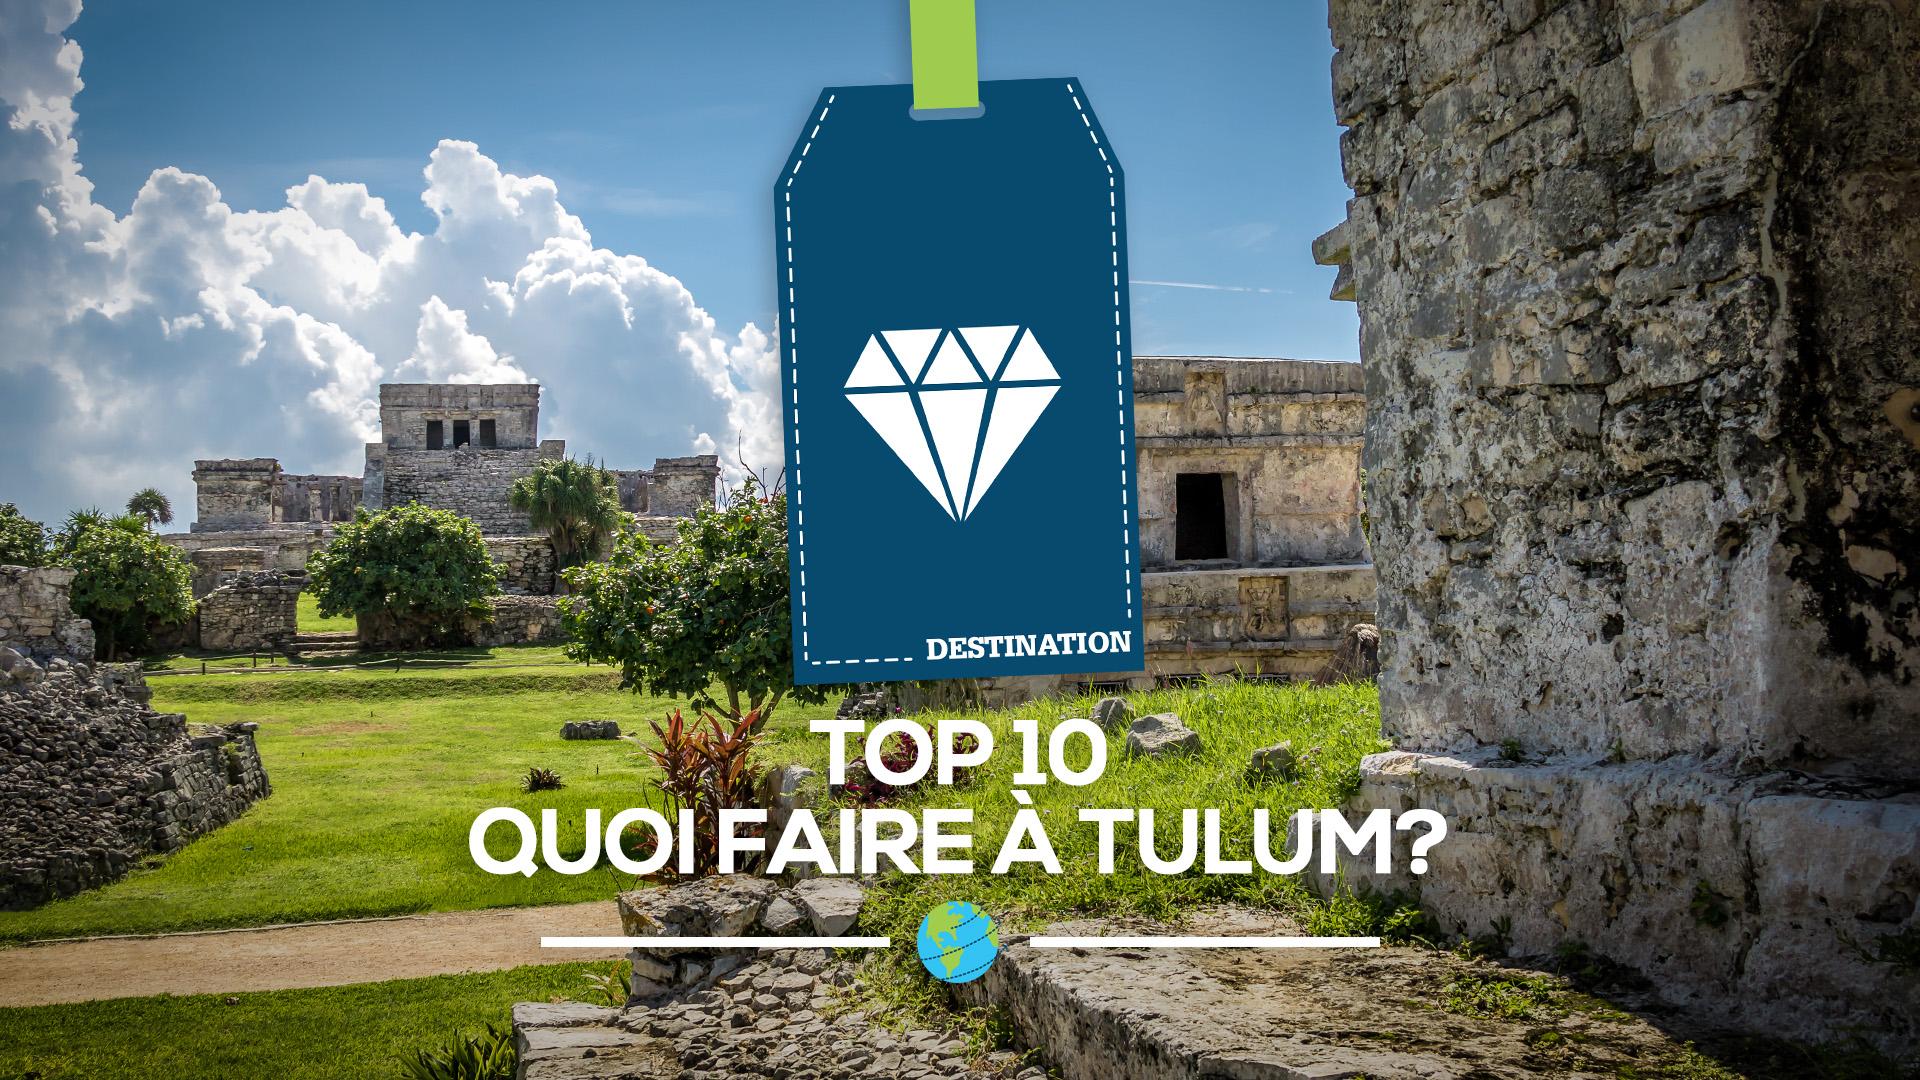 Top 10 tulum hotels